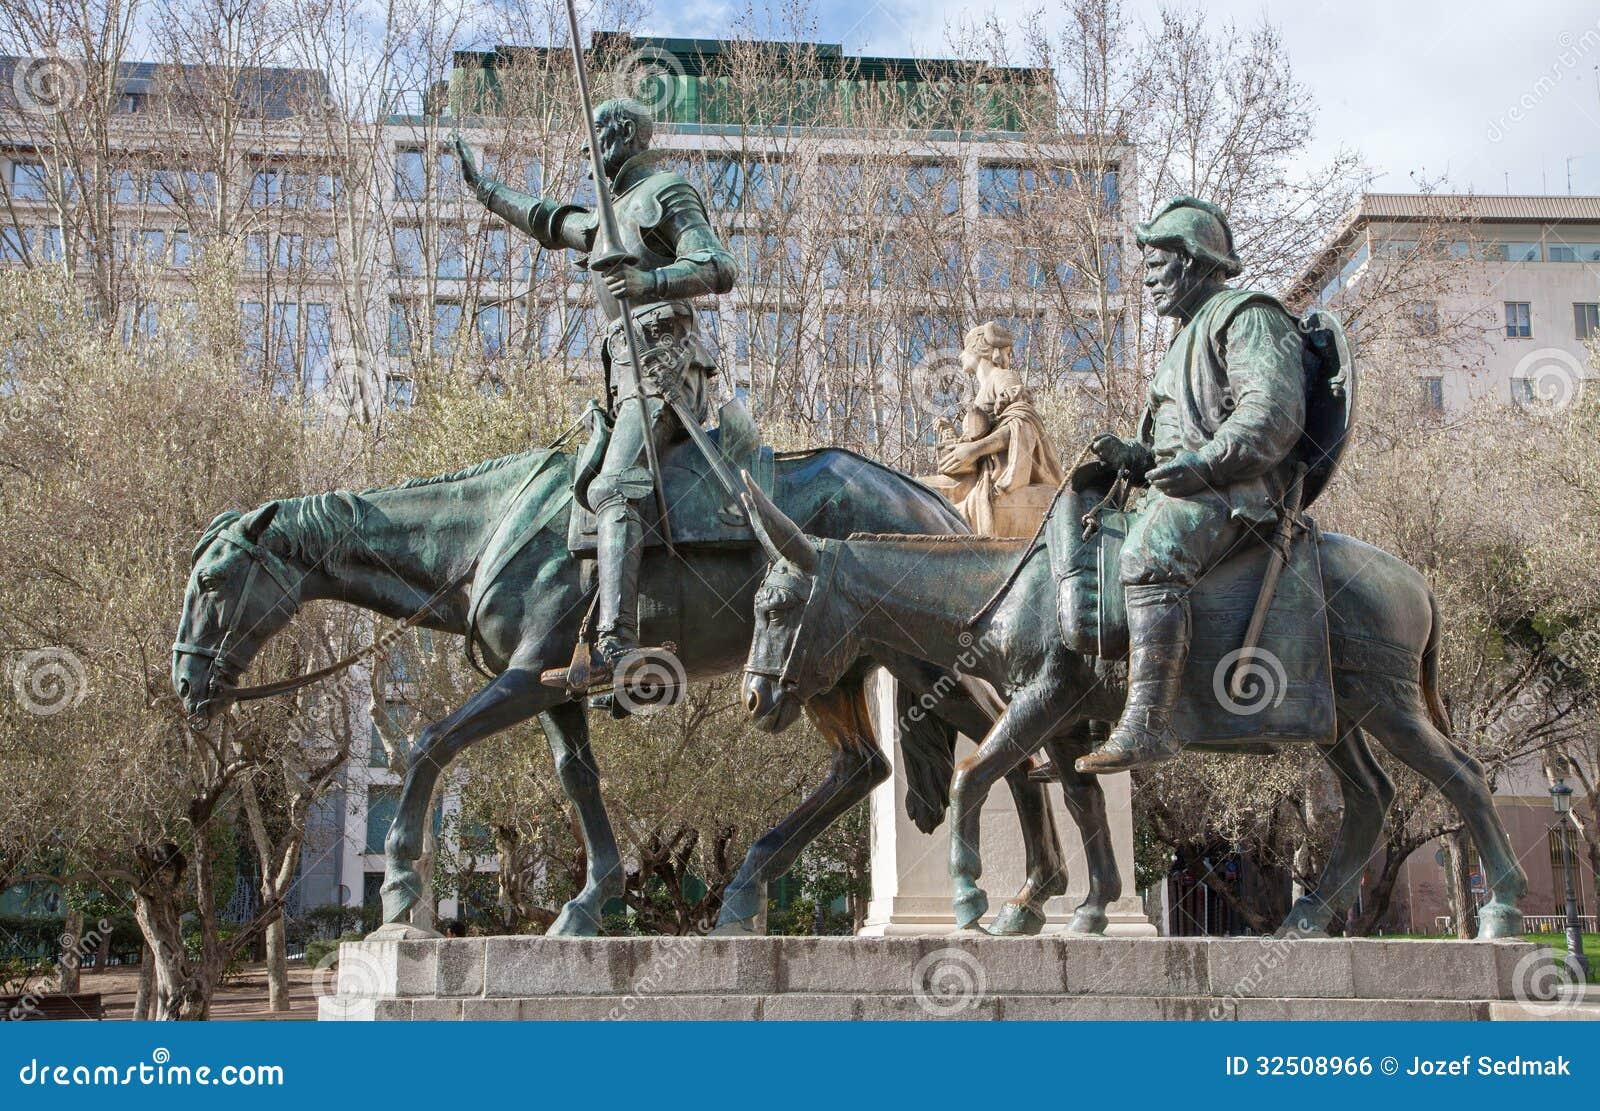 Madrid - Don Quixote And Sancho Panza Statue From Cervantes Memorial